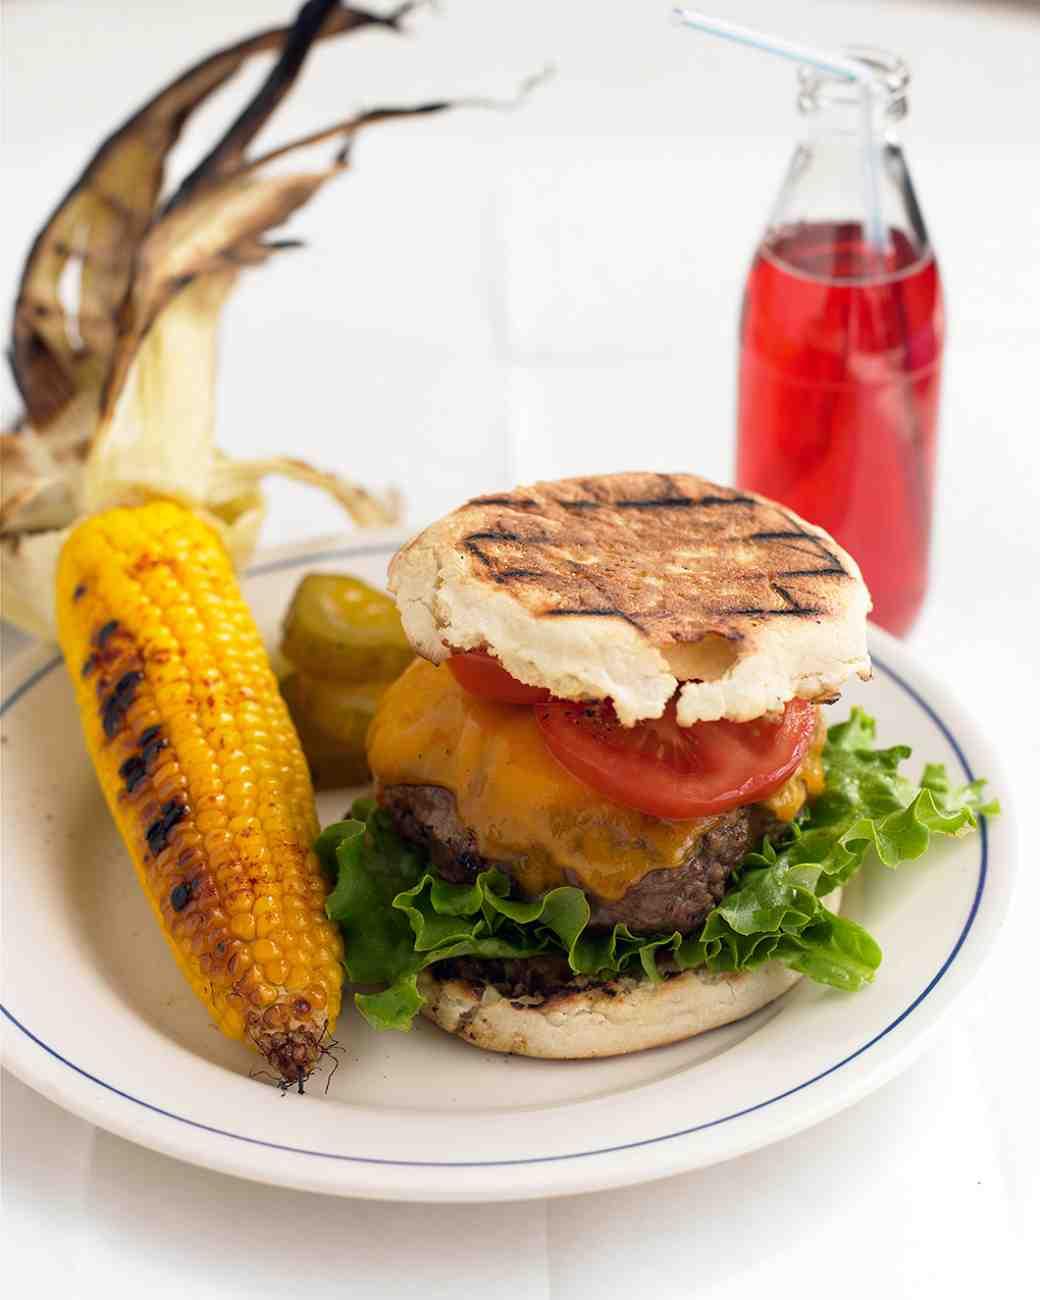 edf_jul06_burger_cheddar_vert